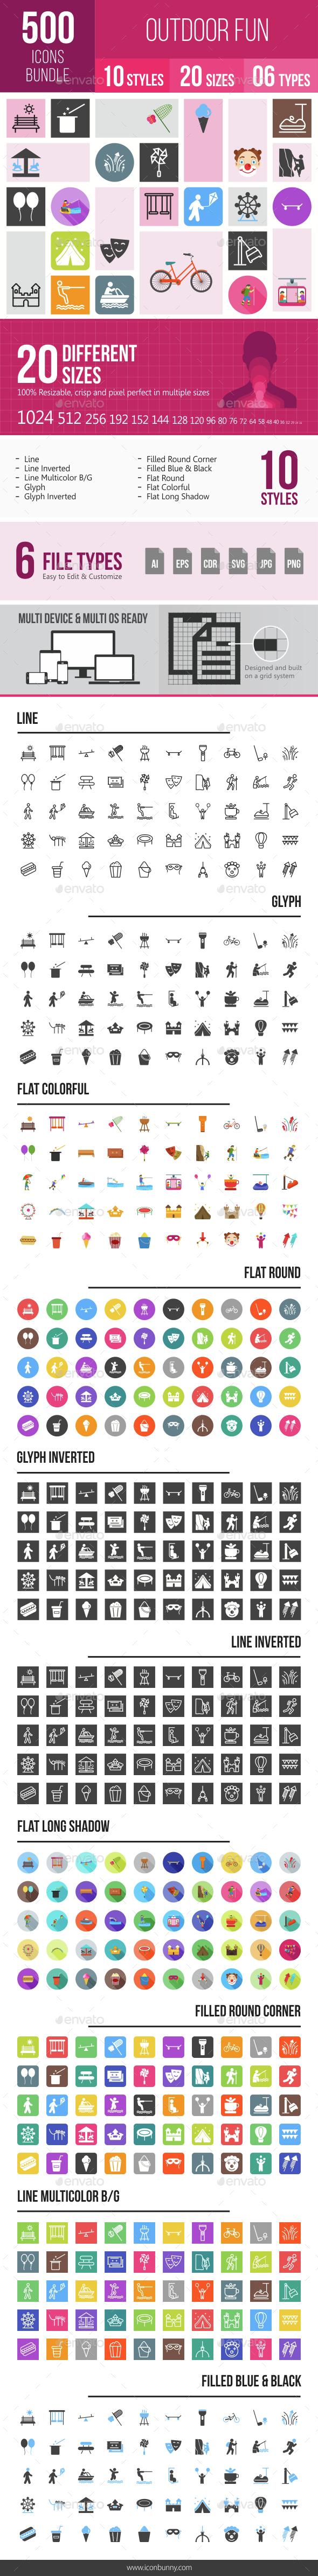 500 Outdoor Fun Icons Bundle - Icons